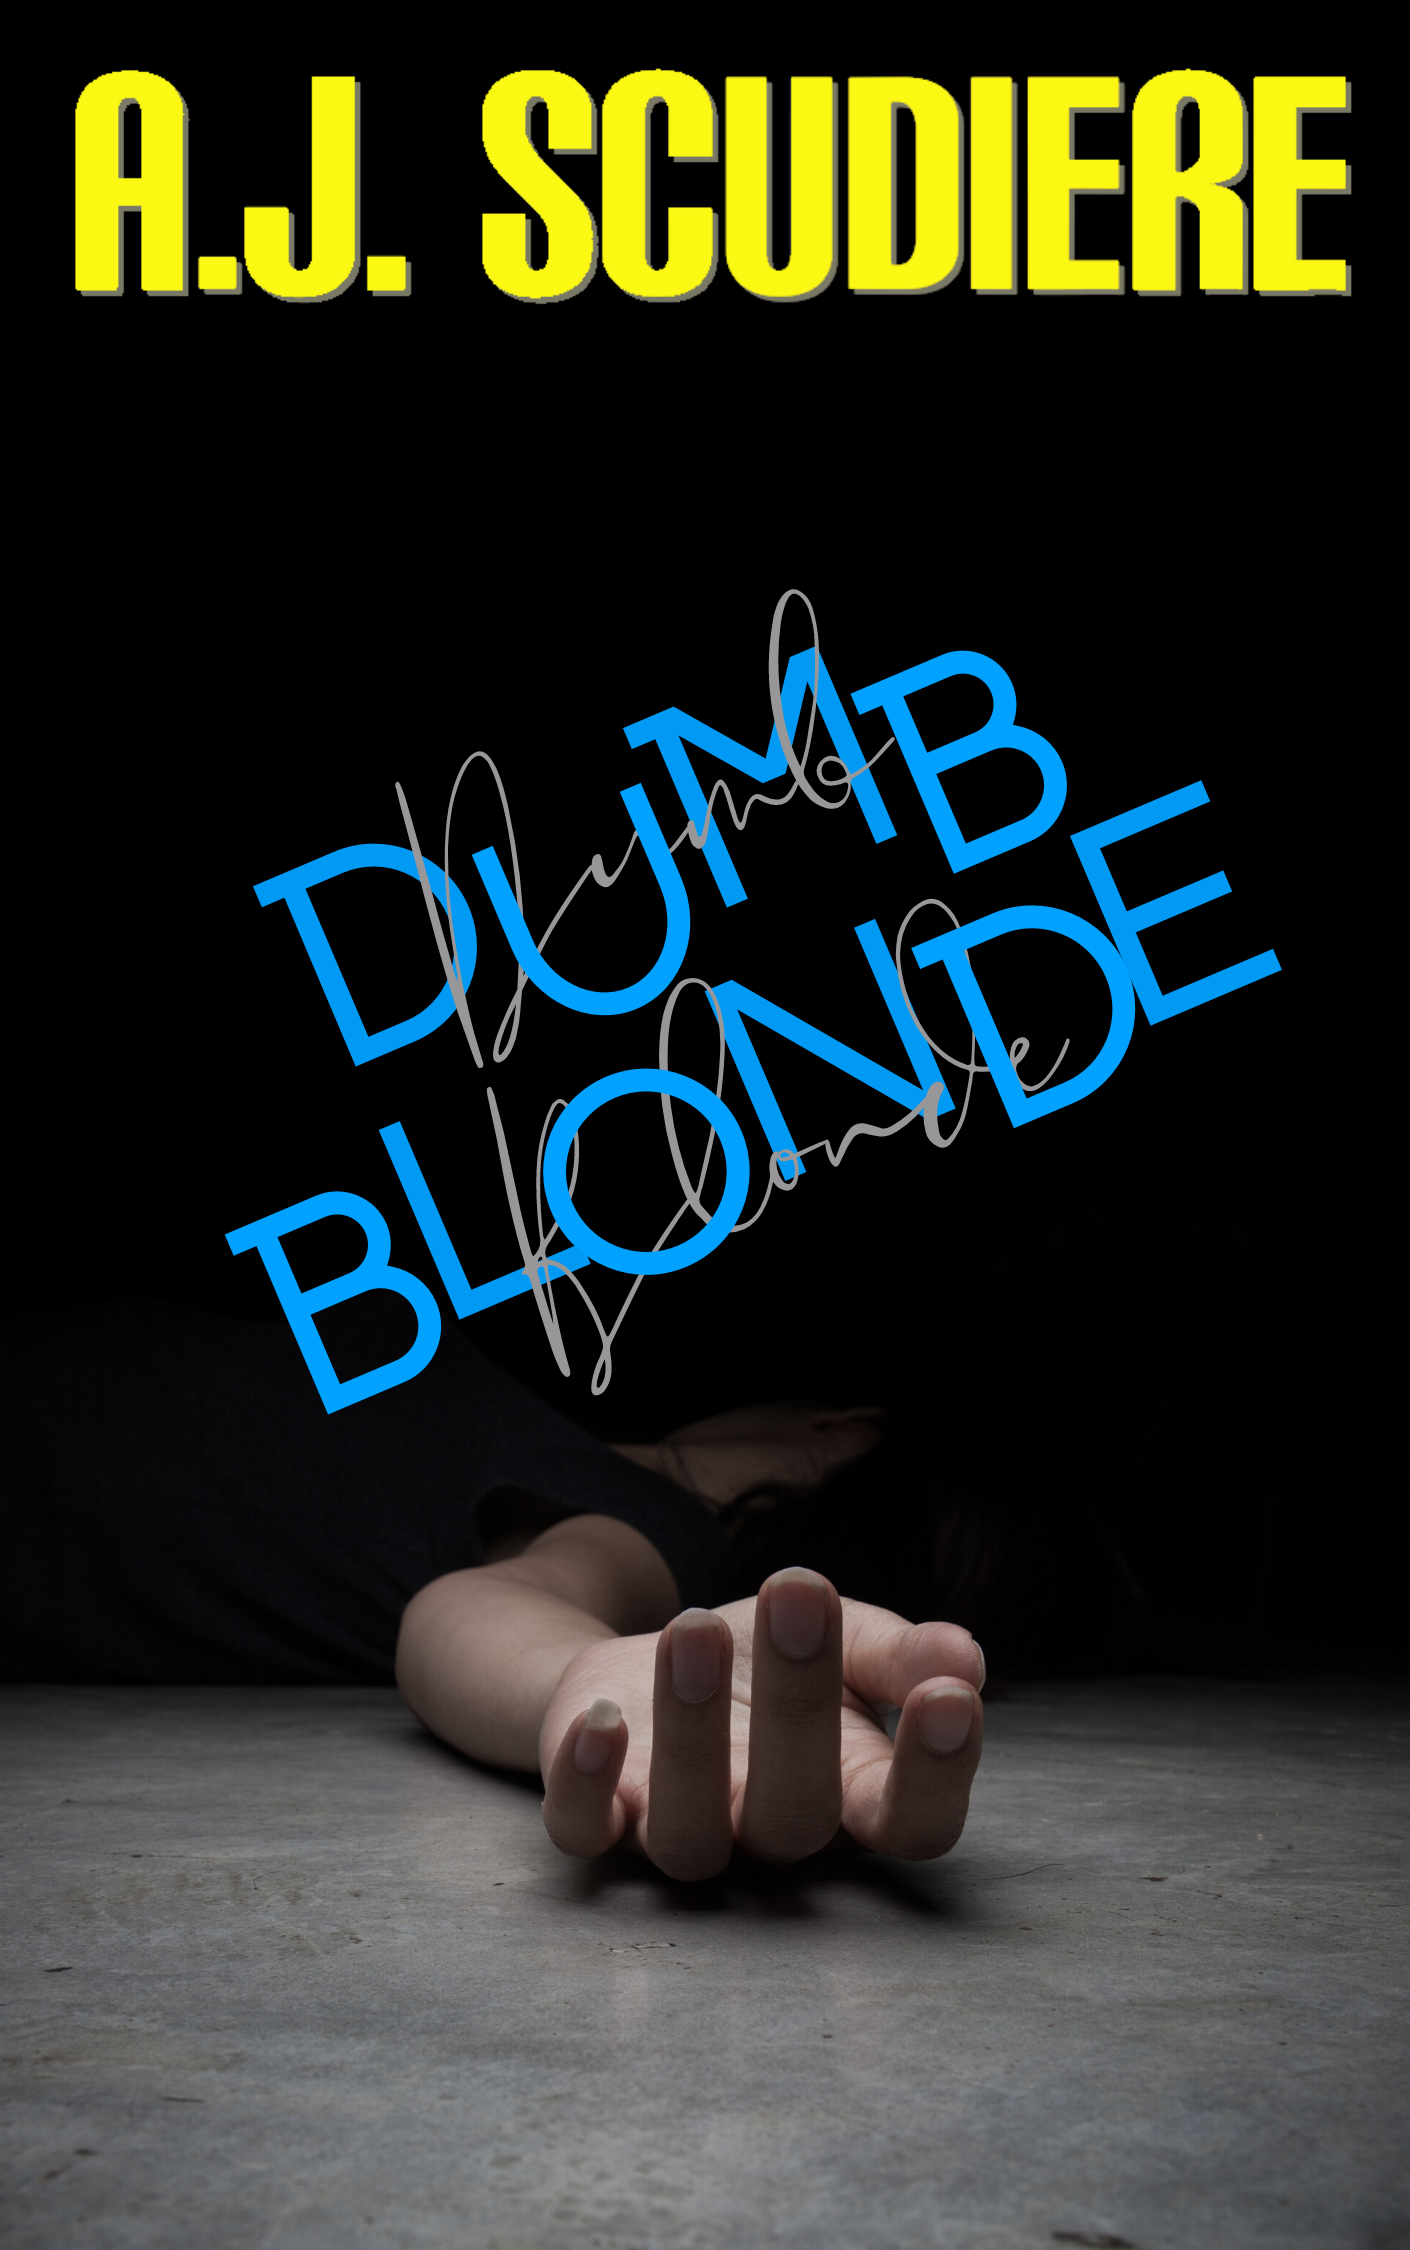 SS Dumb Blonde